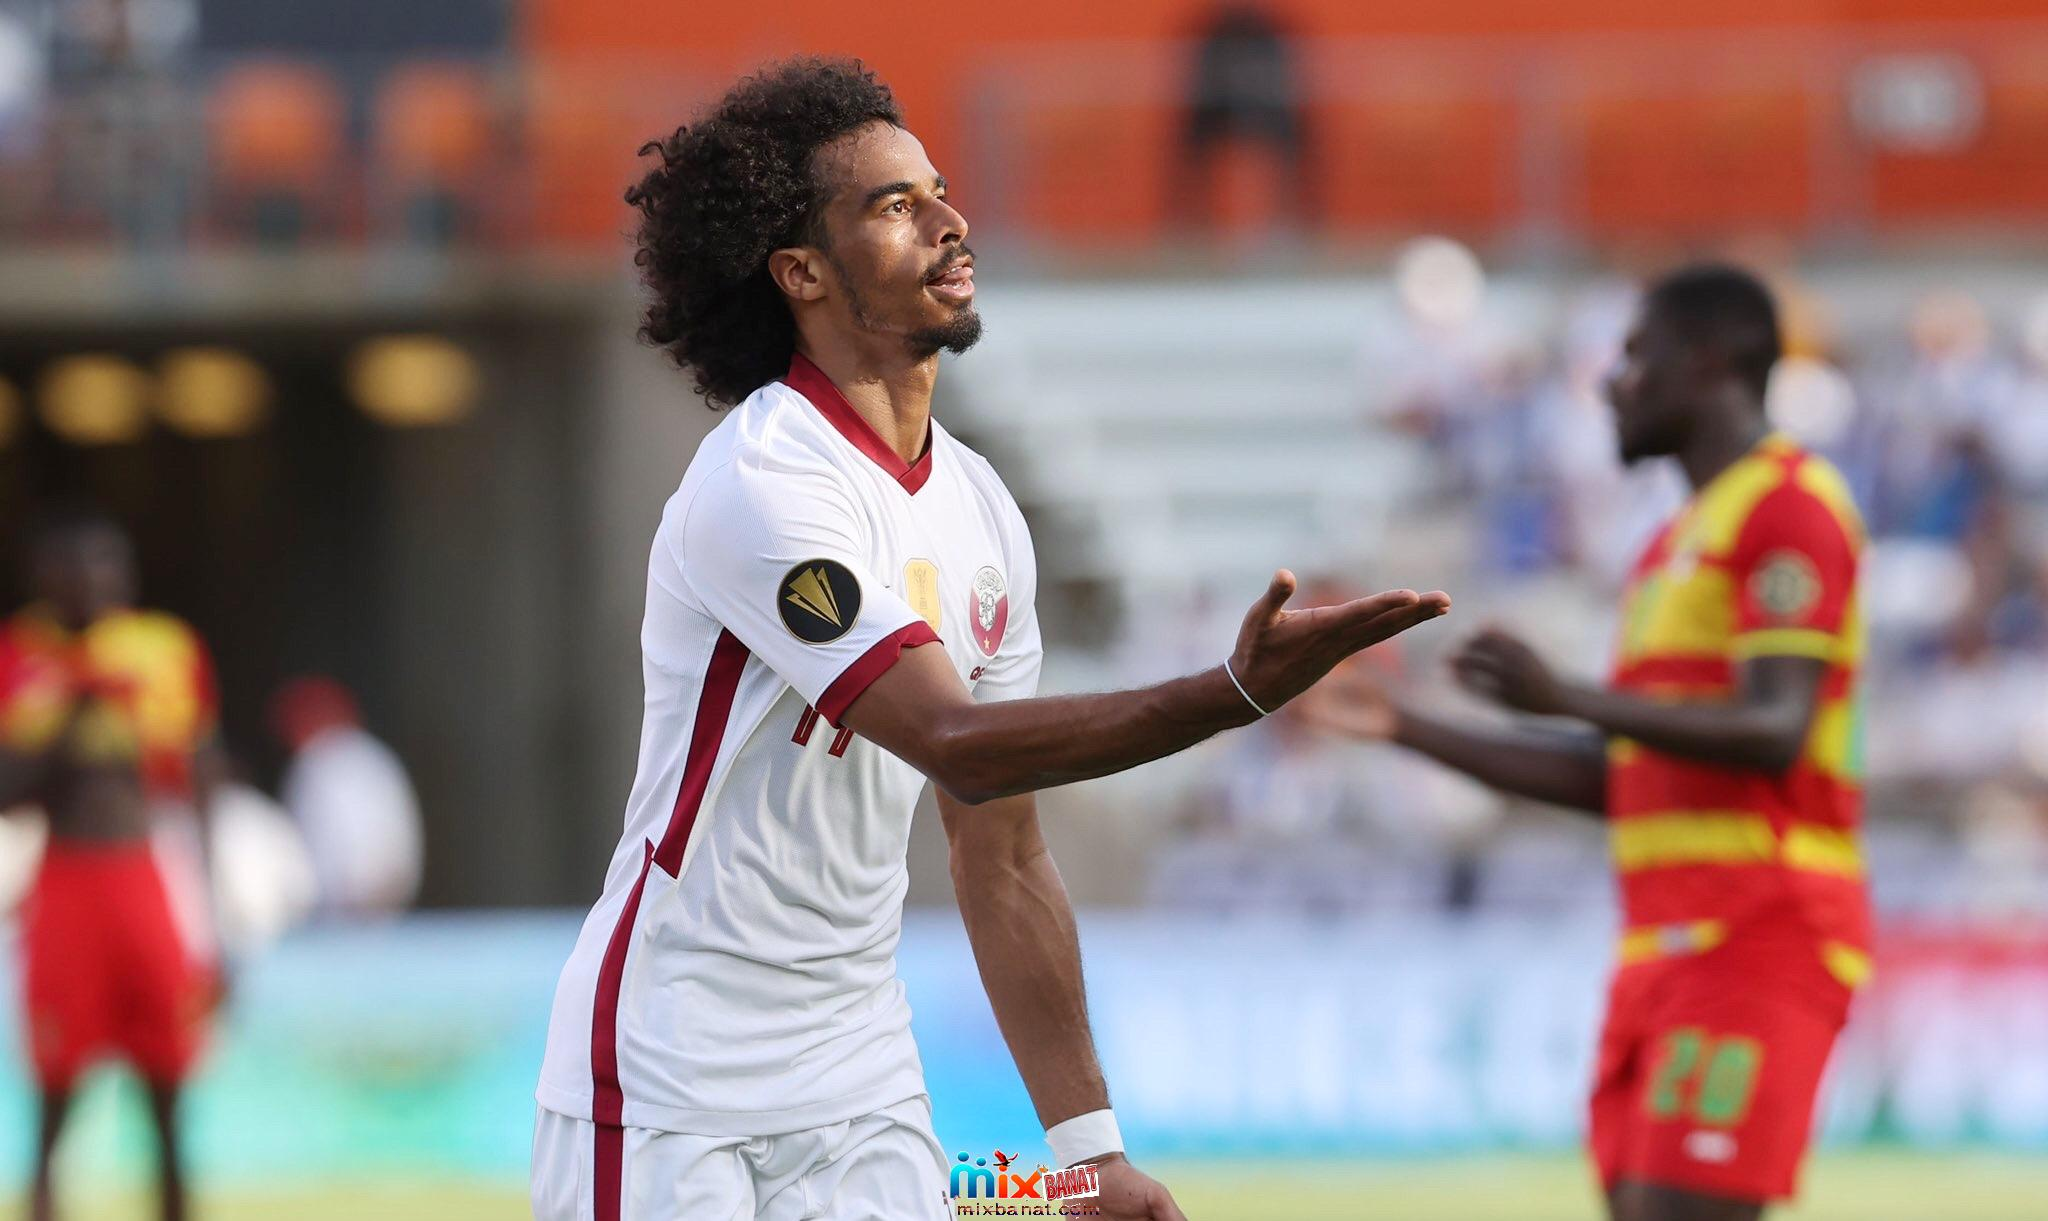 Gold Cup: Qatar National Team Coach Praises Great Win against Grenada